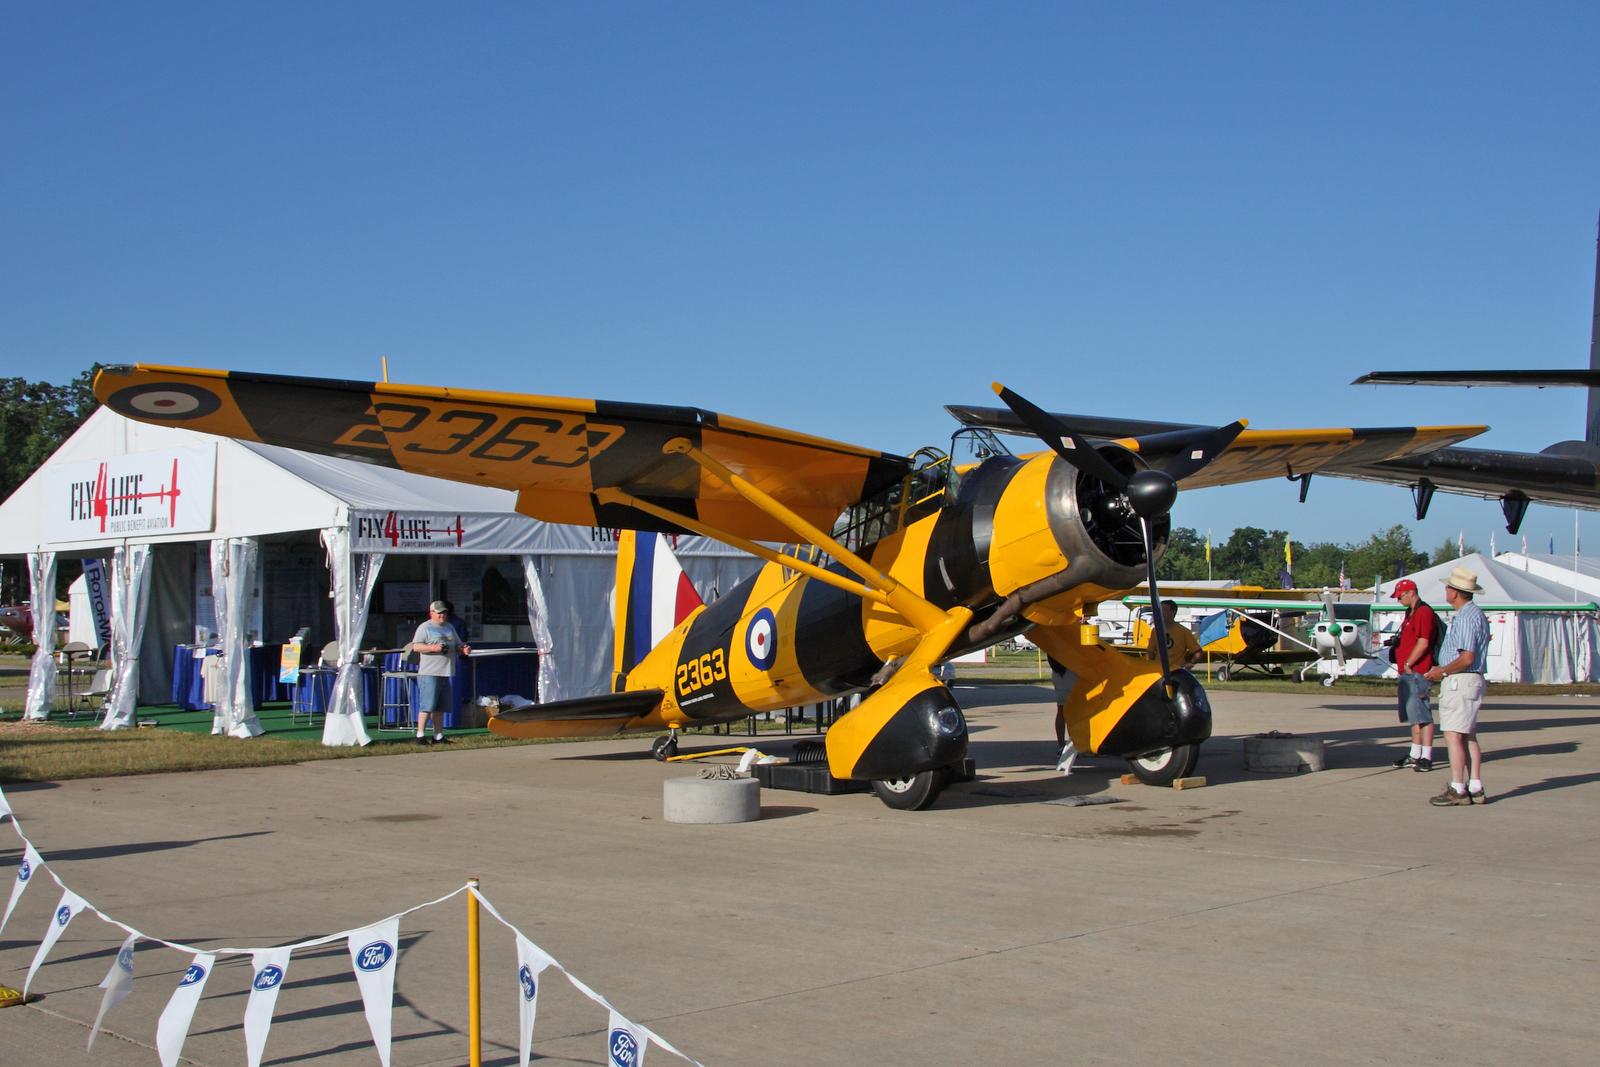 File:Westland Lysander 2363 at 2009 Oshkosh Air Show Flickr 3821375214.jpg